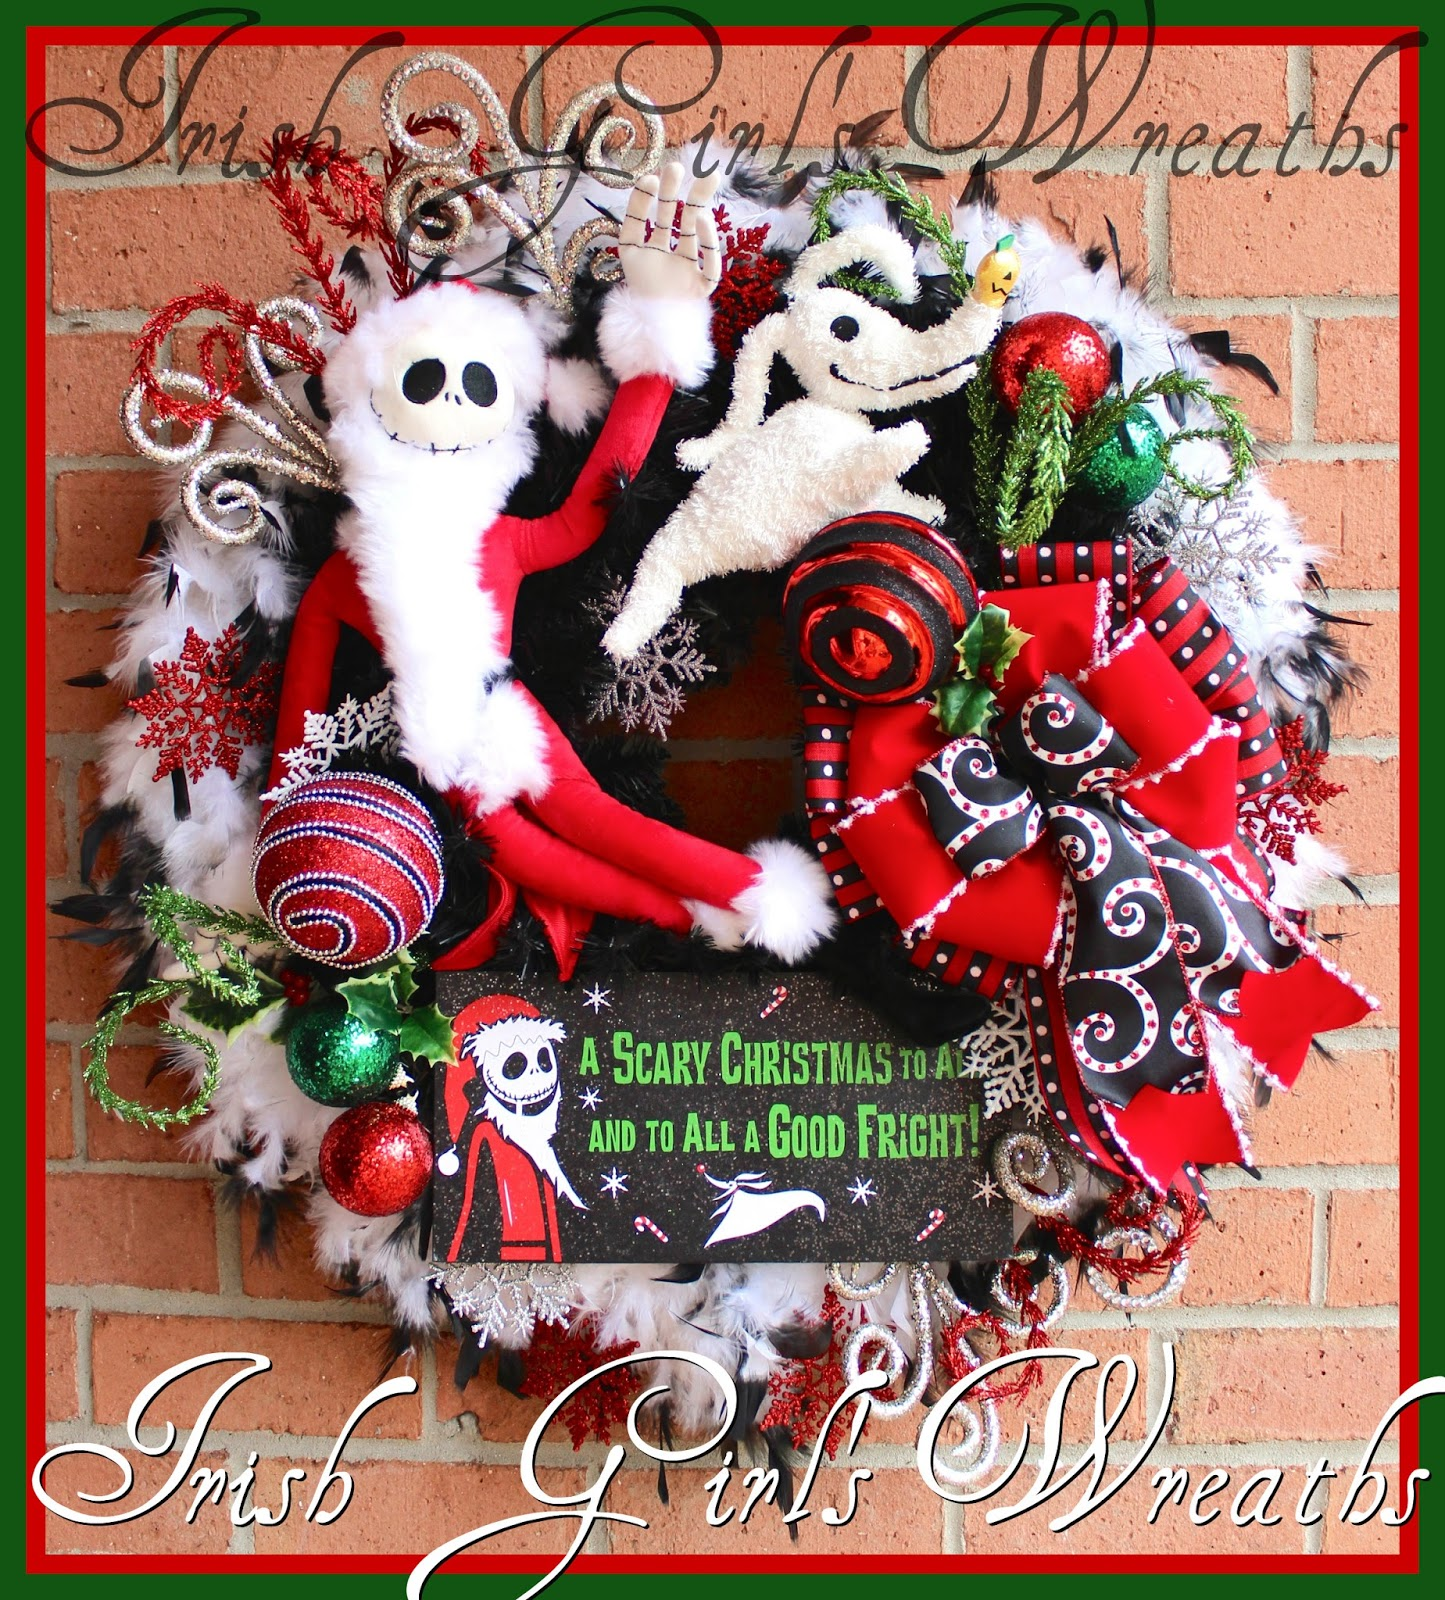 Nightmare Before Christmas Wreath | www.topsimages.com